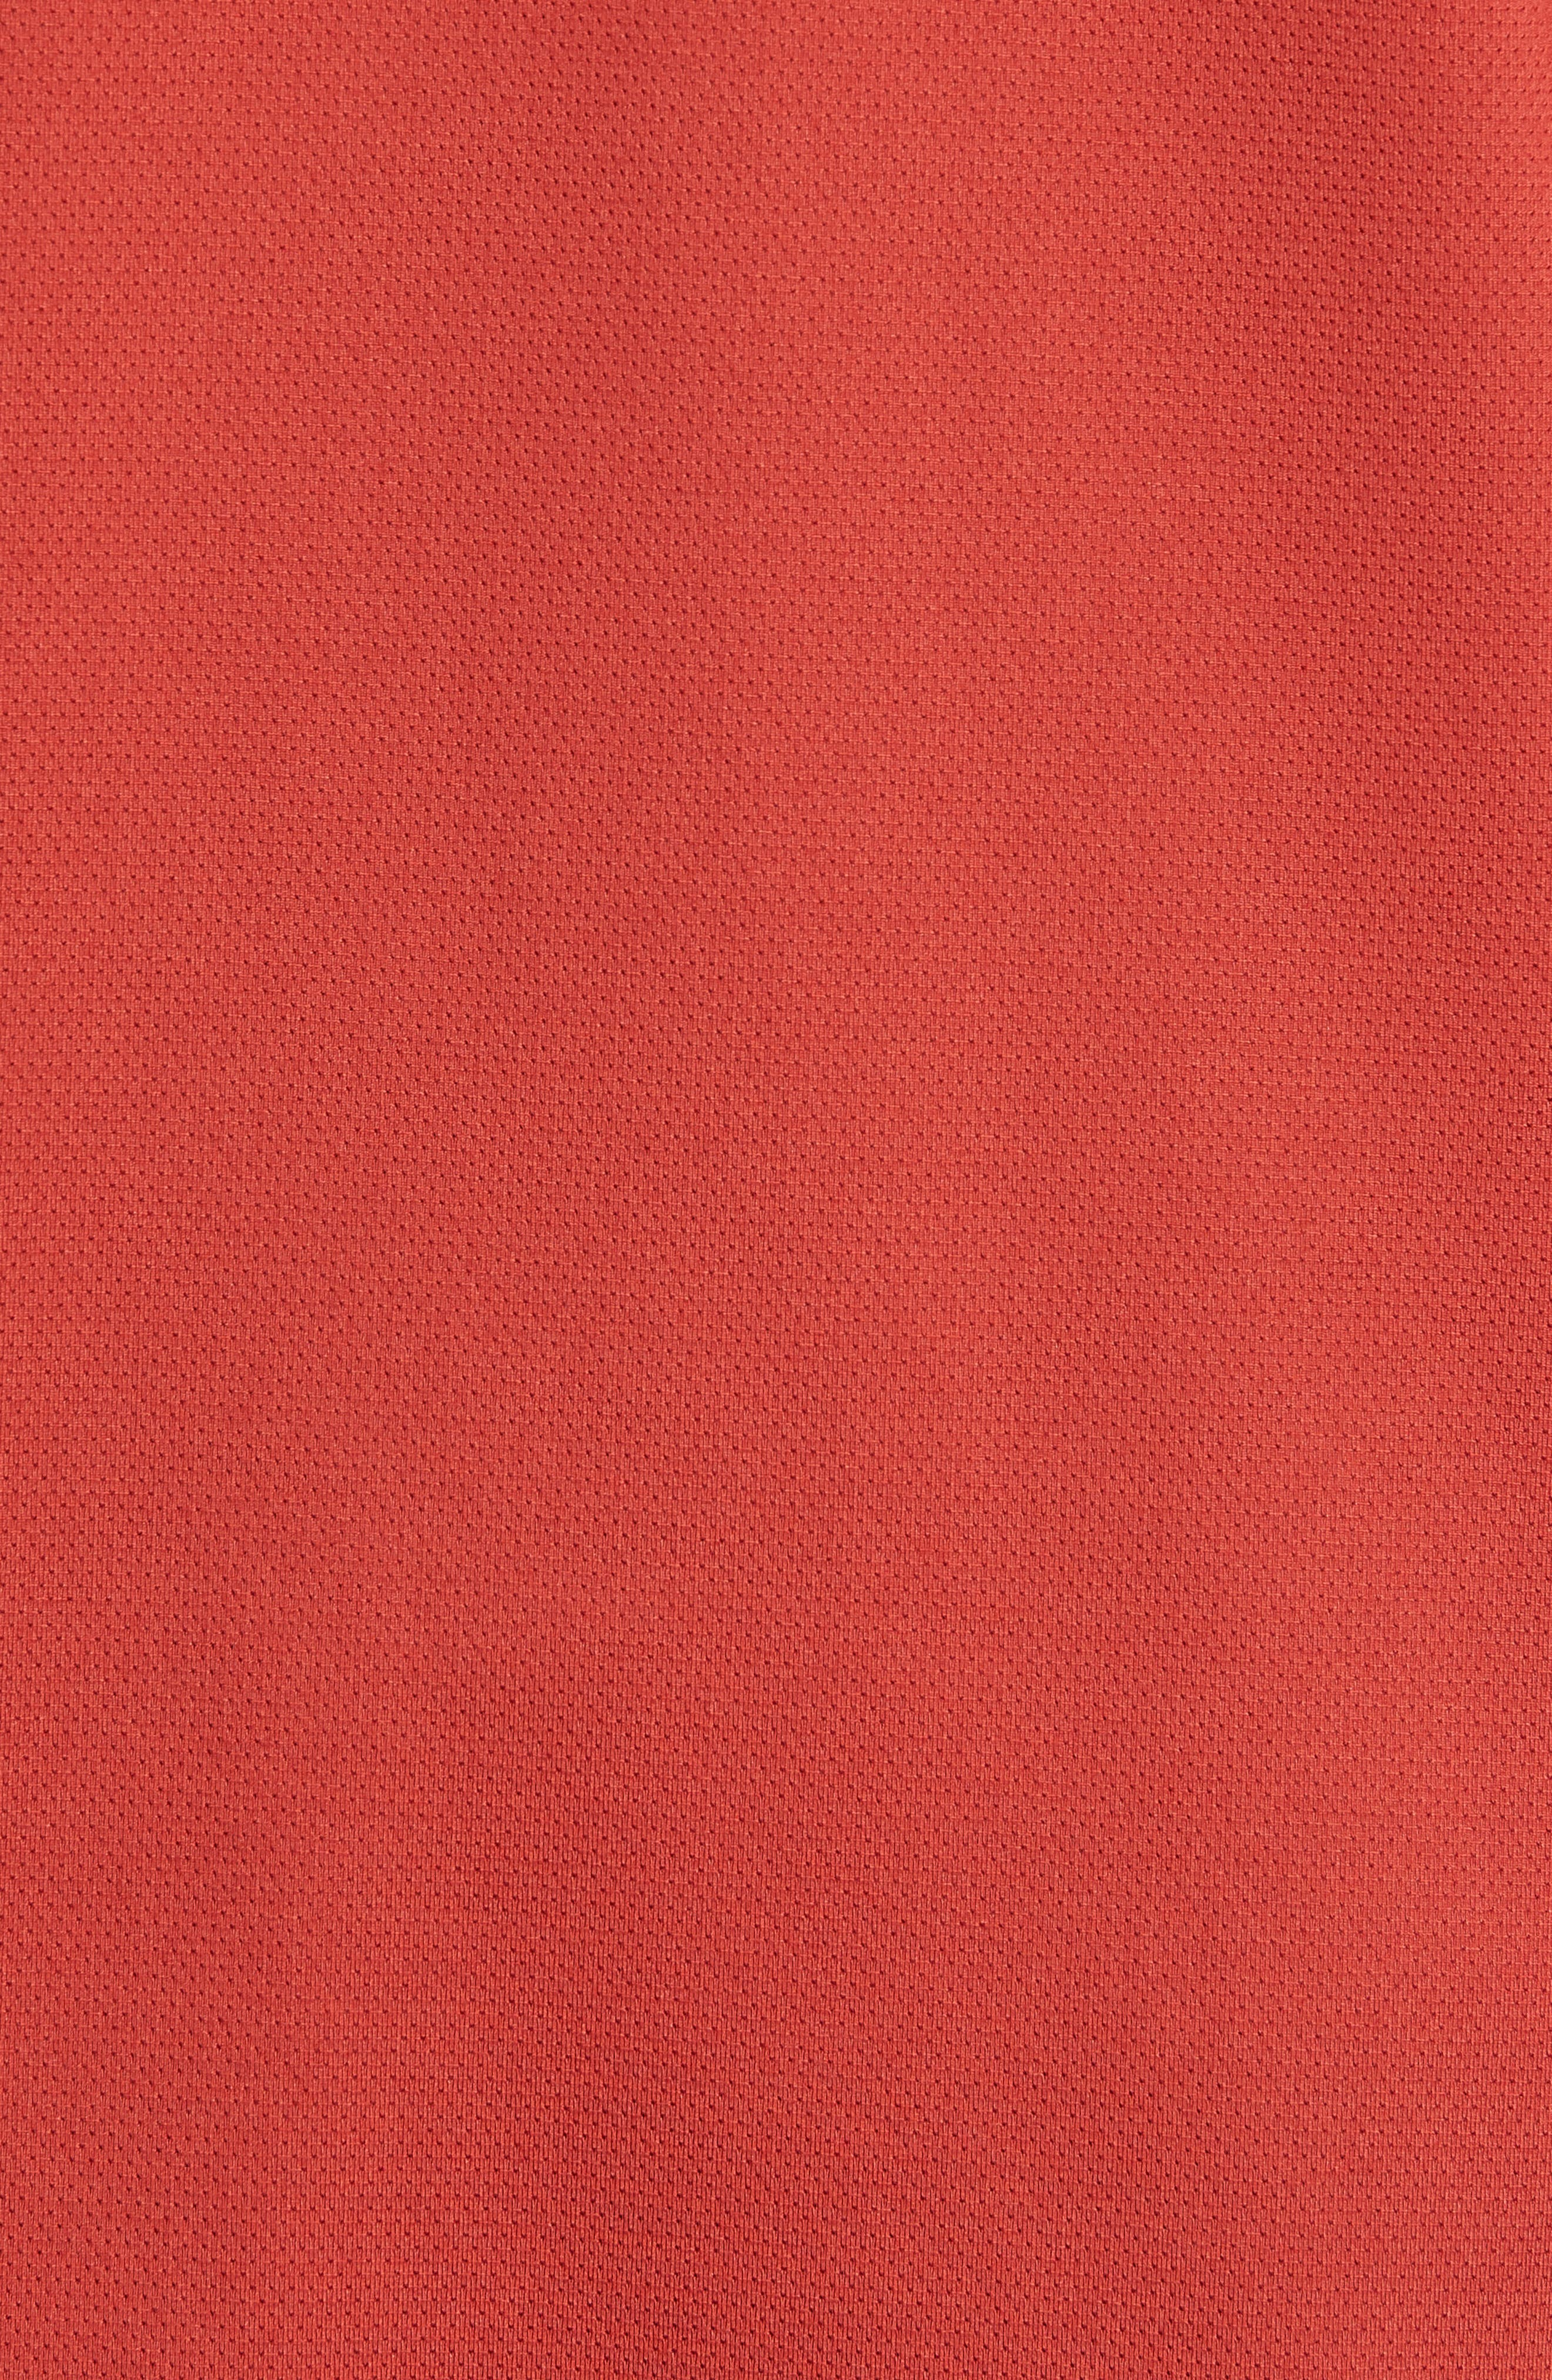 NIKE,                             Element HZ 2.0 Performance Pullover,                             Alternate thumbnail 5, color,                             DUNE RED